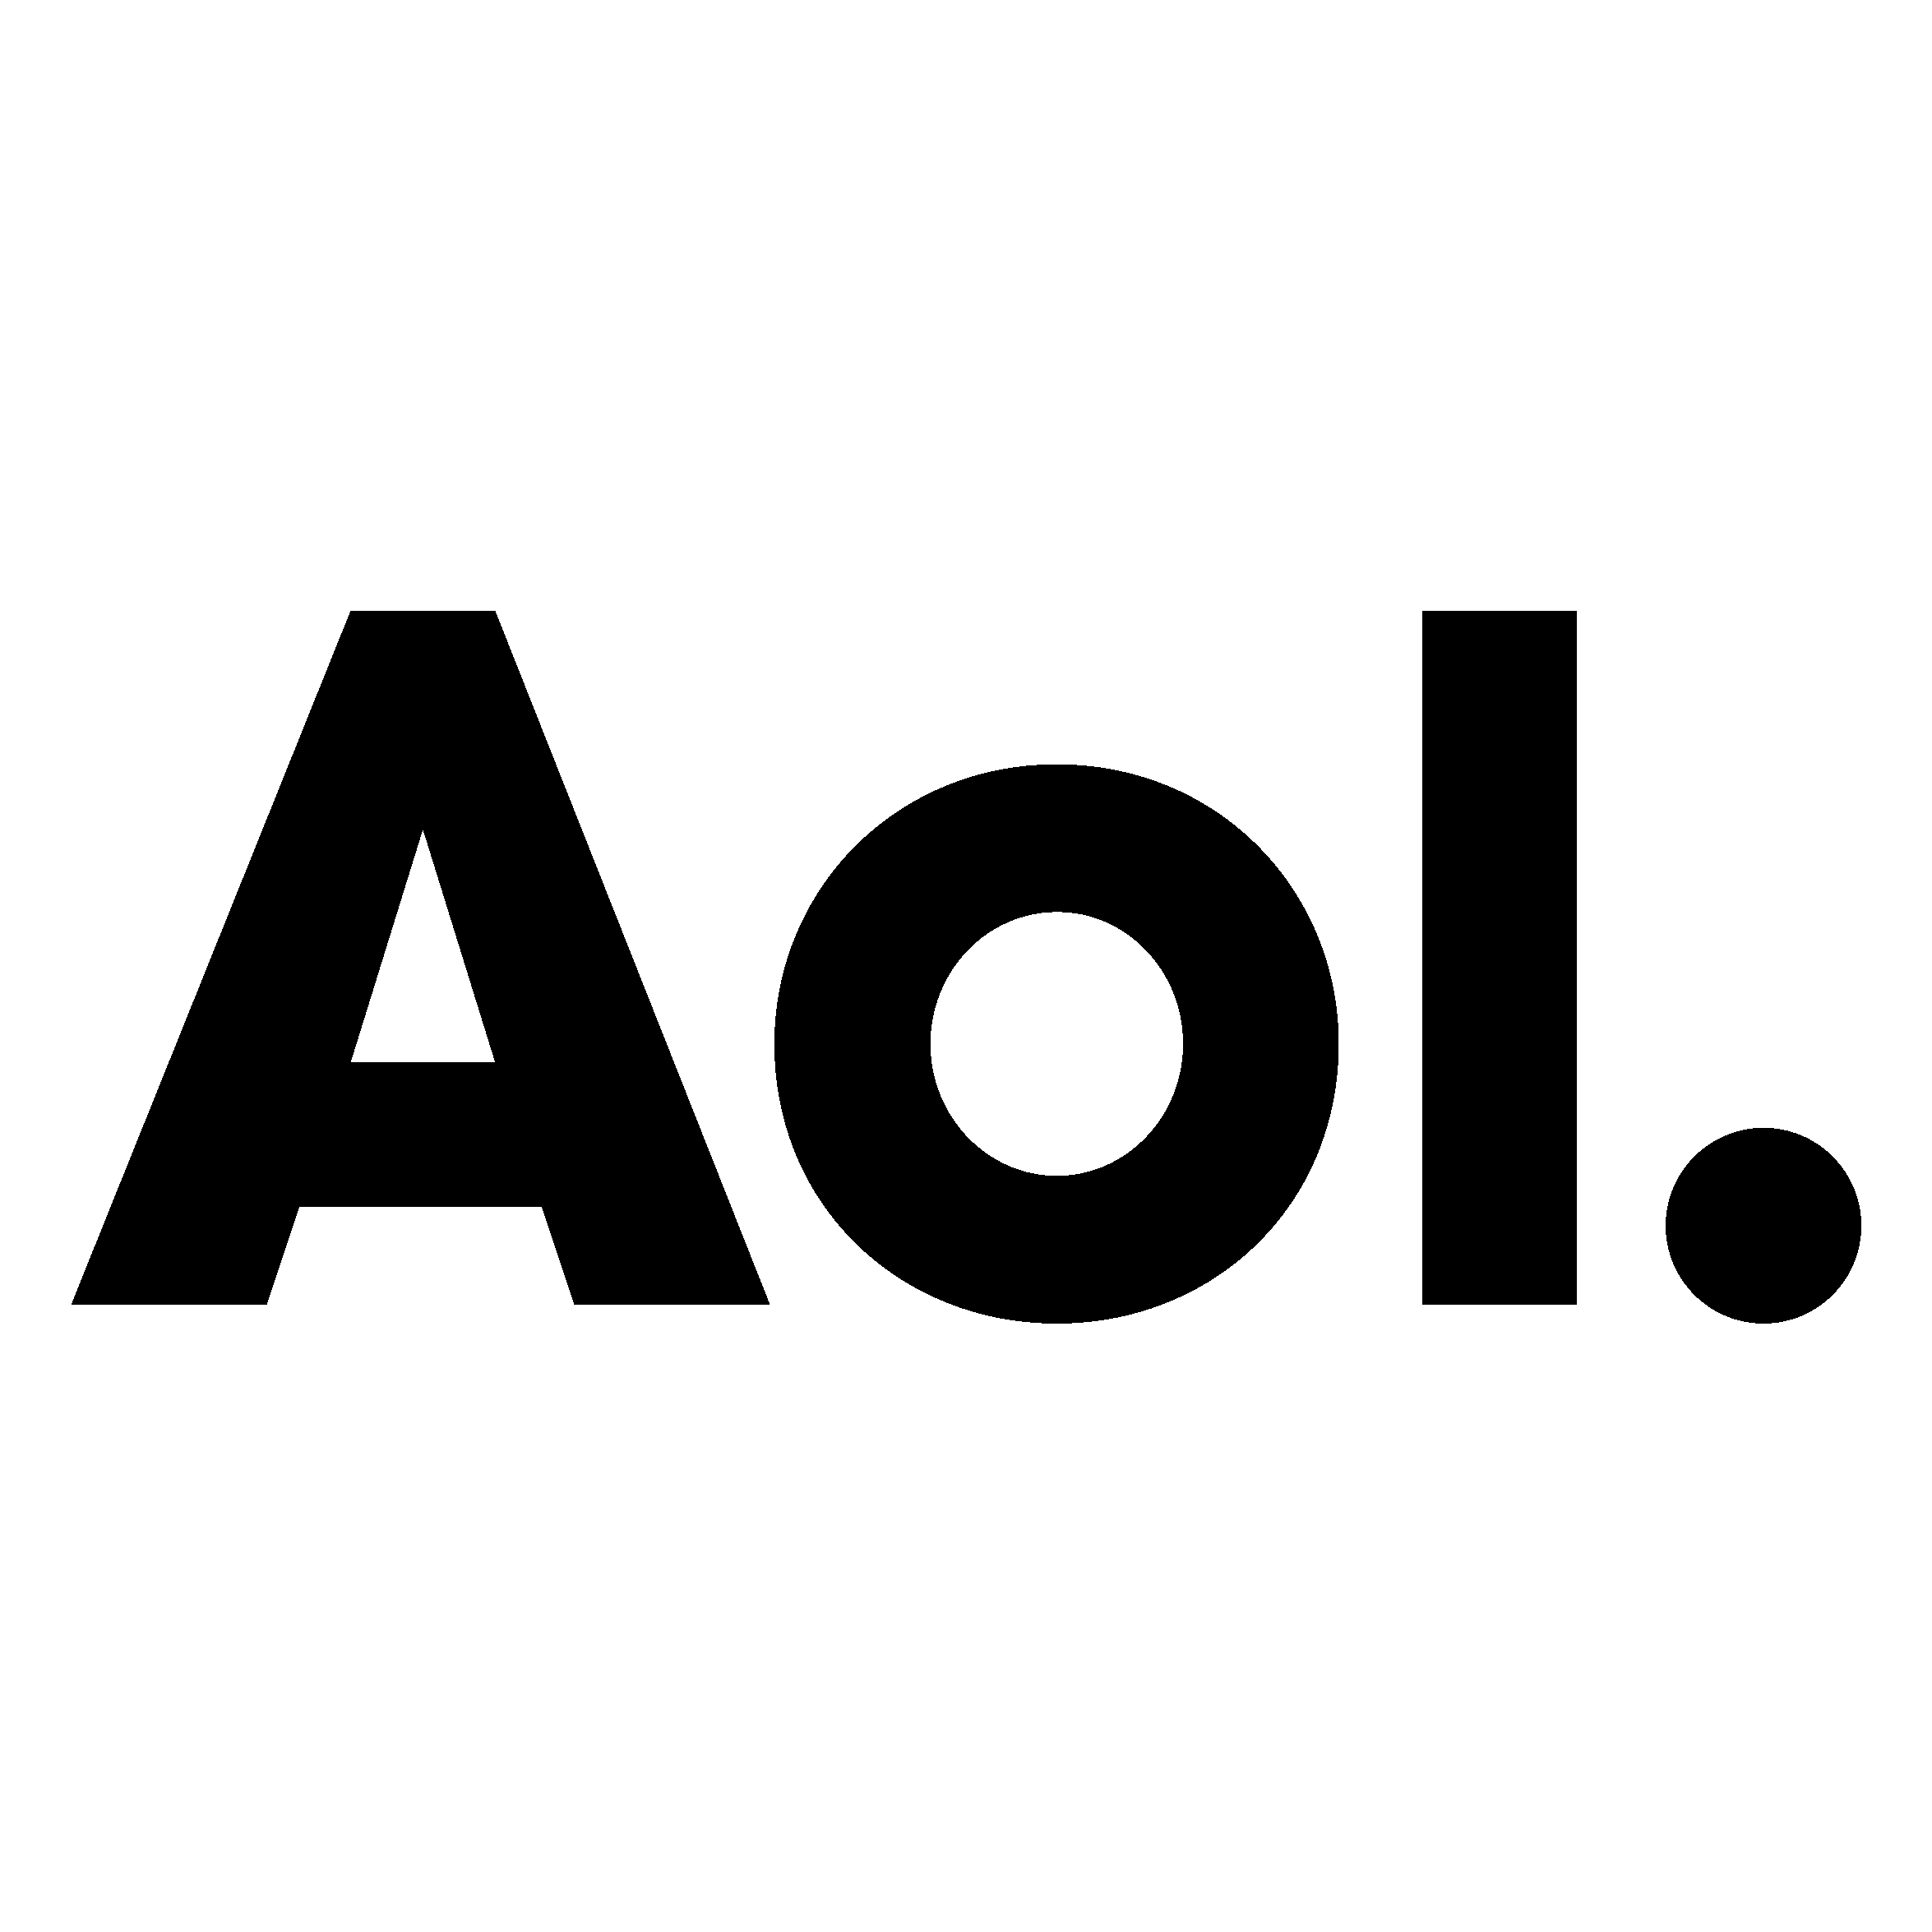 AOL Logo Black